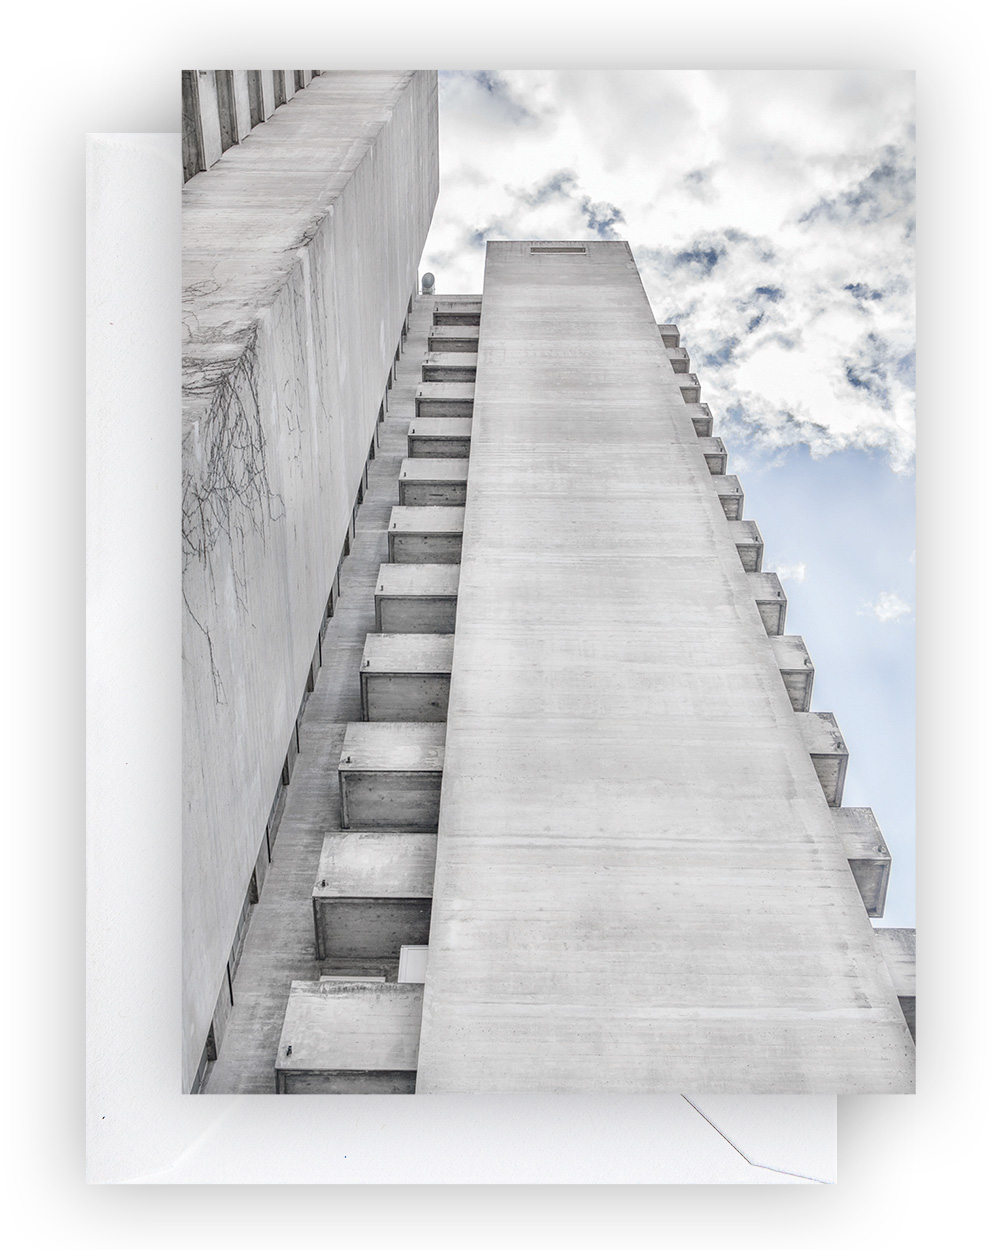 Triemli Tower Postcard, A6 I Zürich Brut Edition I © HEARTBRUT / Karin Hunter Bürki